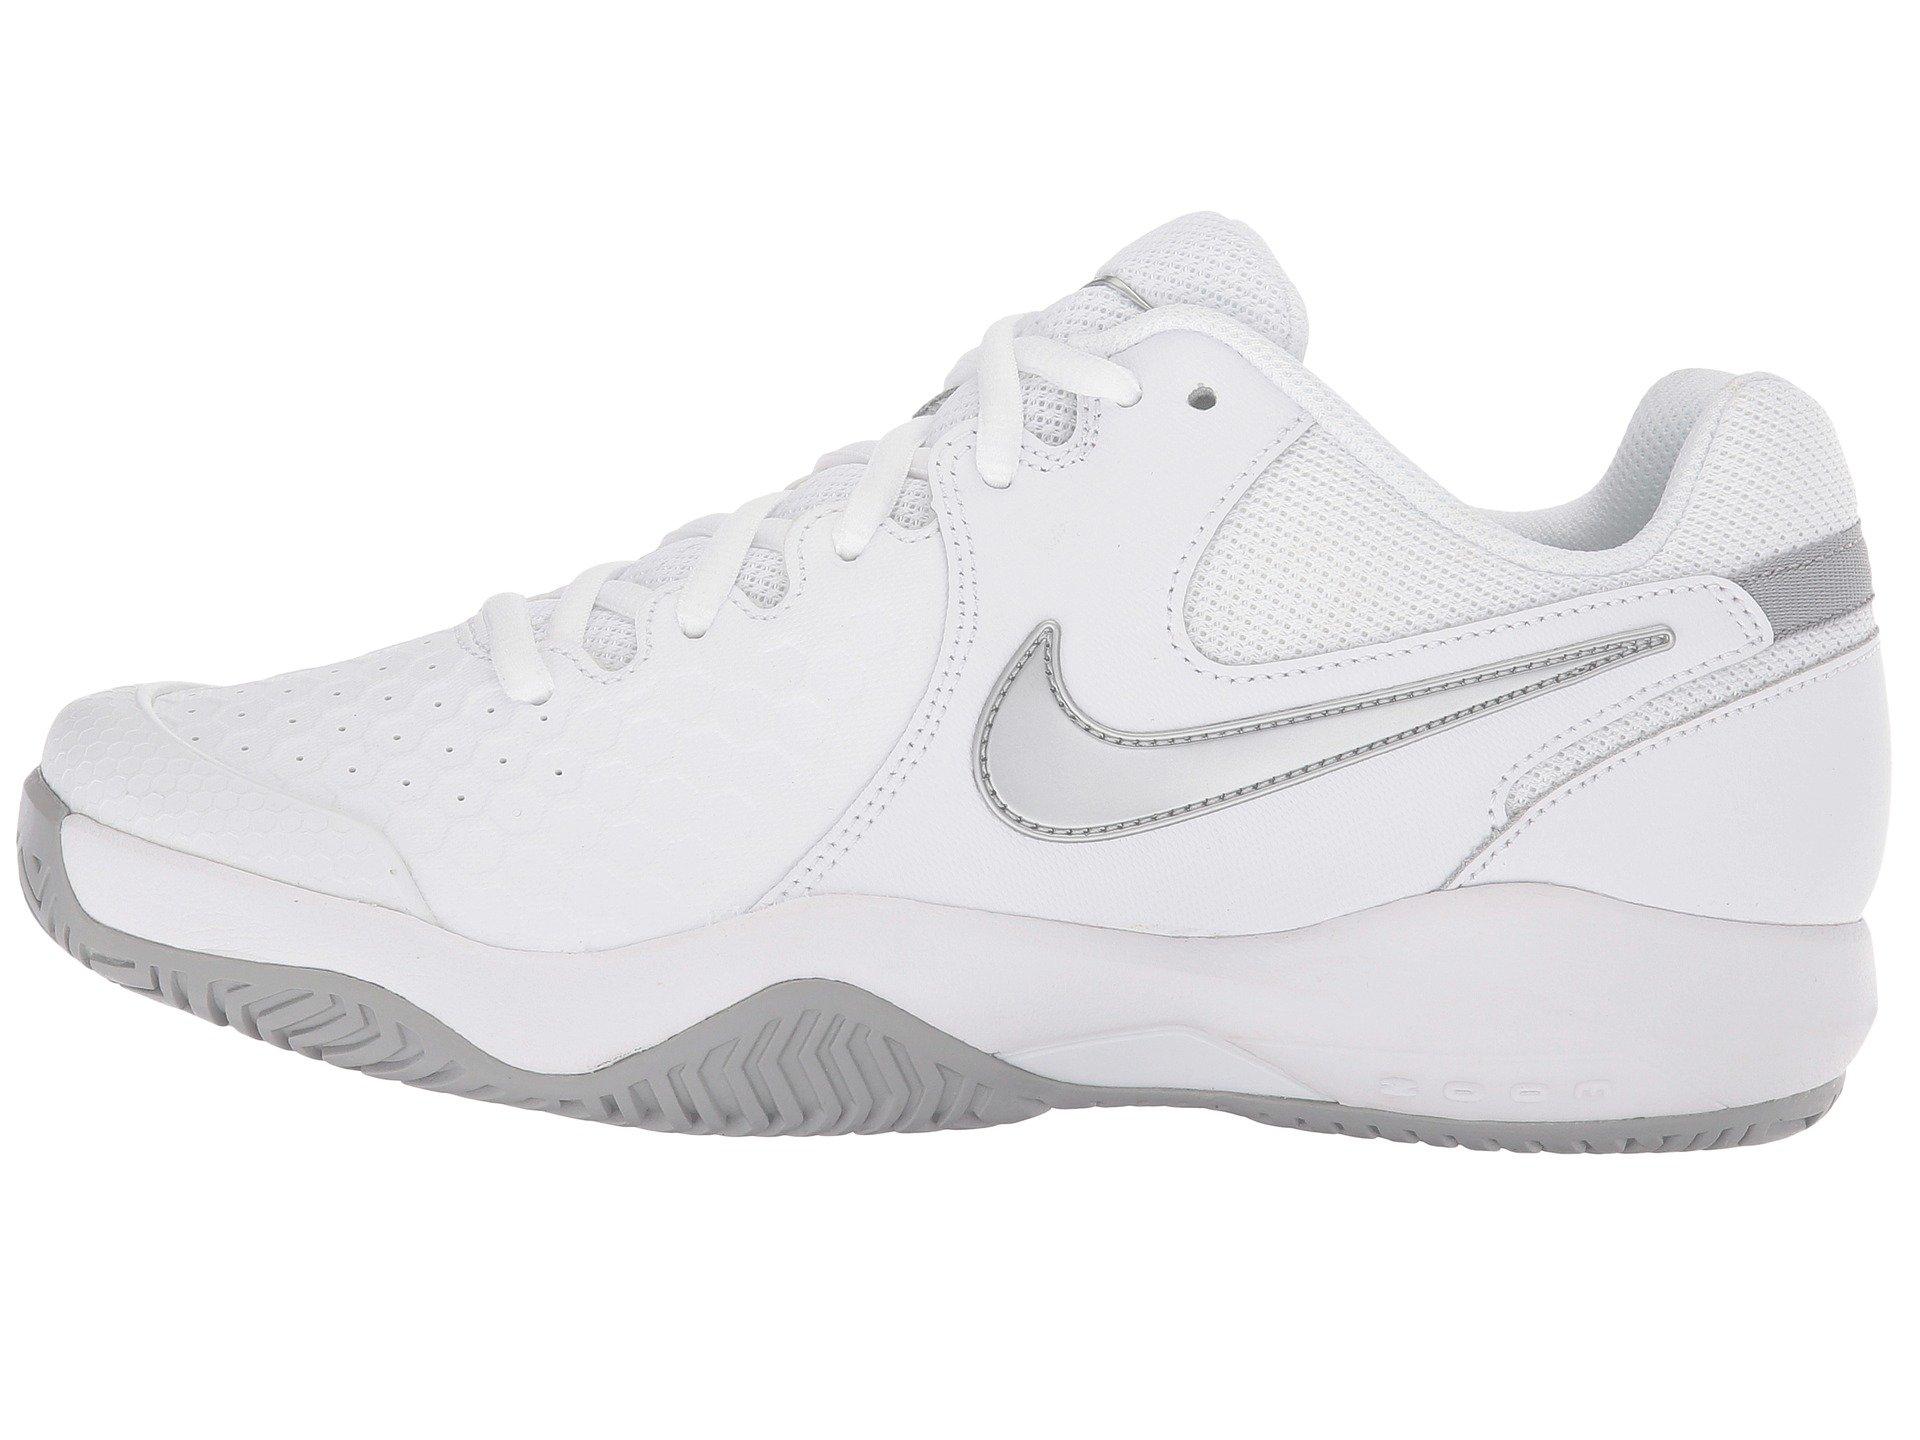 newest 1214e f54a0 nike roshe women s shoes